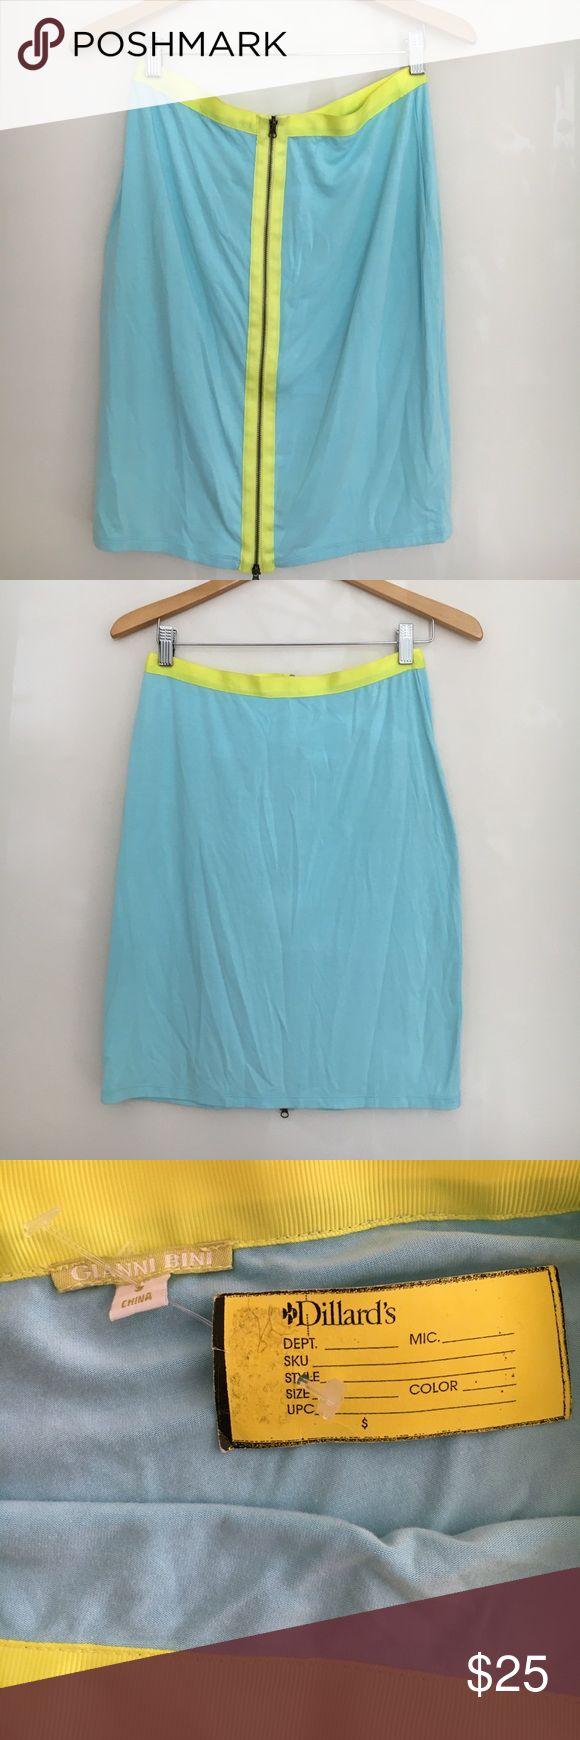 NWT Gianni Bini skirt 💙 NWT Gianna Bini skirt. 92% rayon, 8 % spandex. It's length approximately 20 inches and waist 28 inches. Gianni Bini Skirts Mini